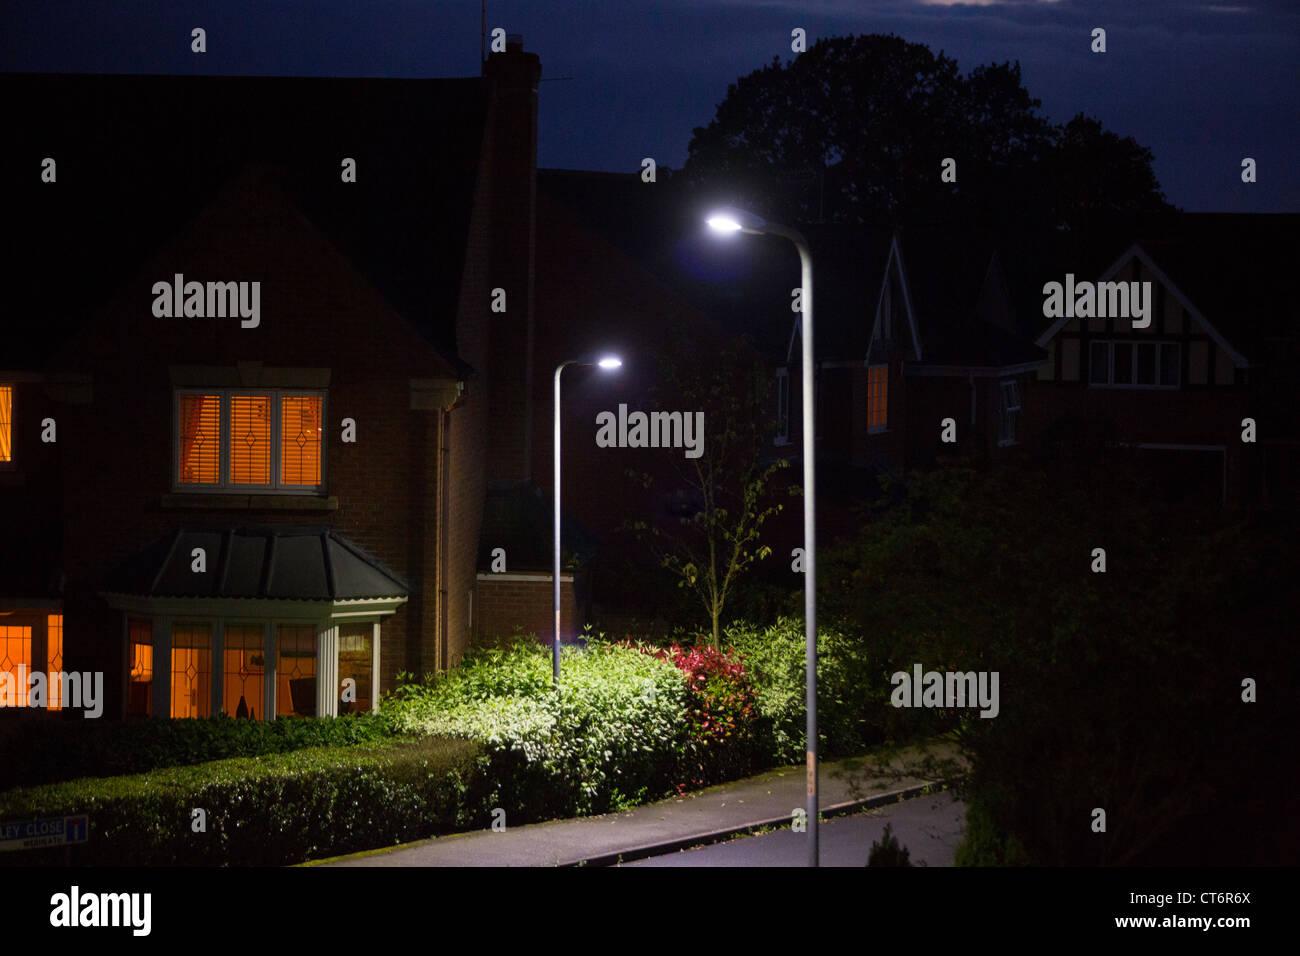 LED street lighting in Redditch, Worcestershire, UK - Stock Image